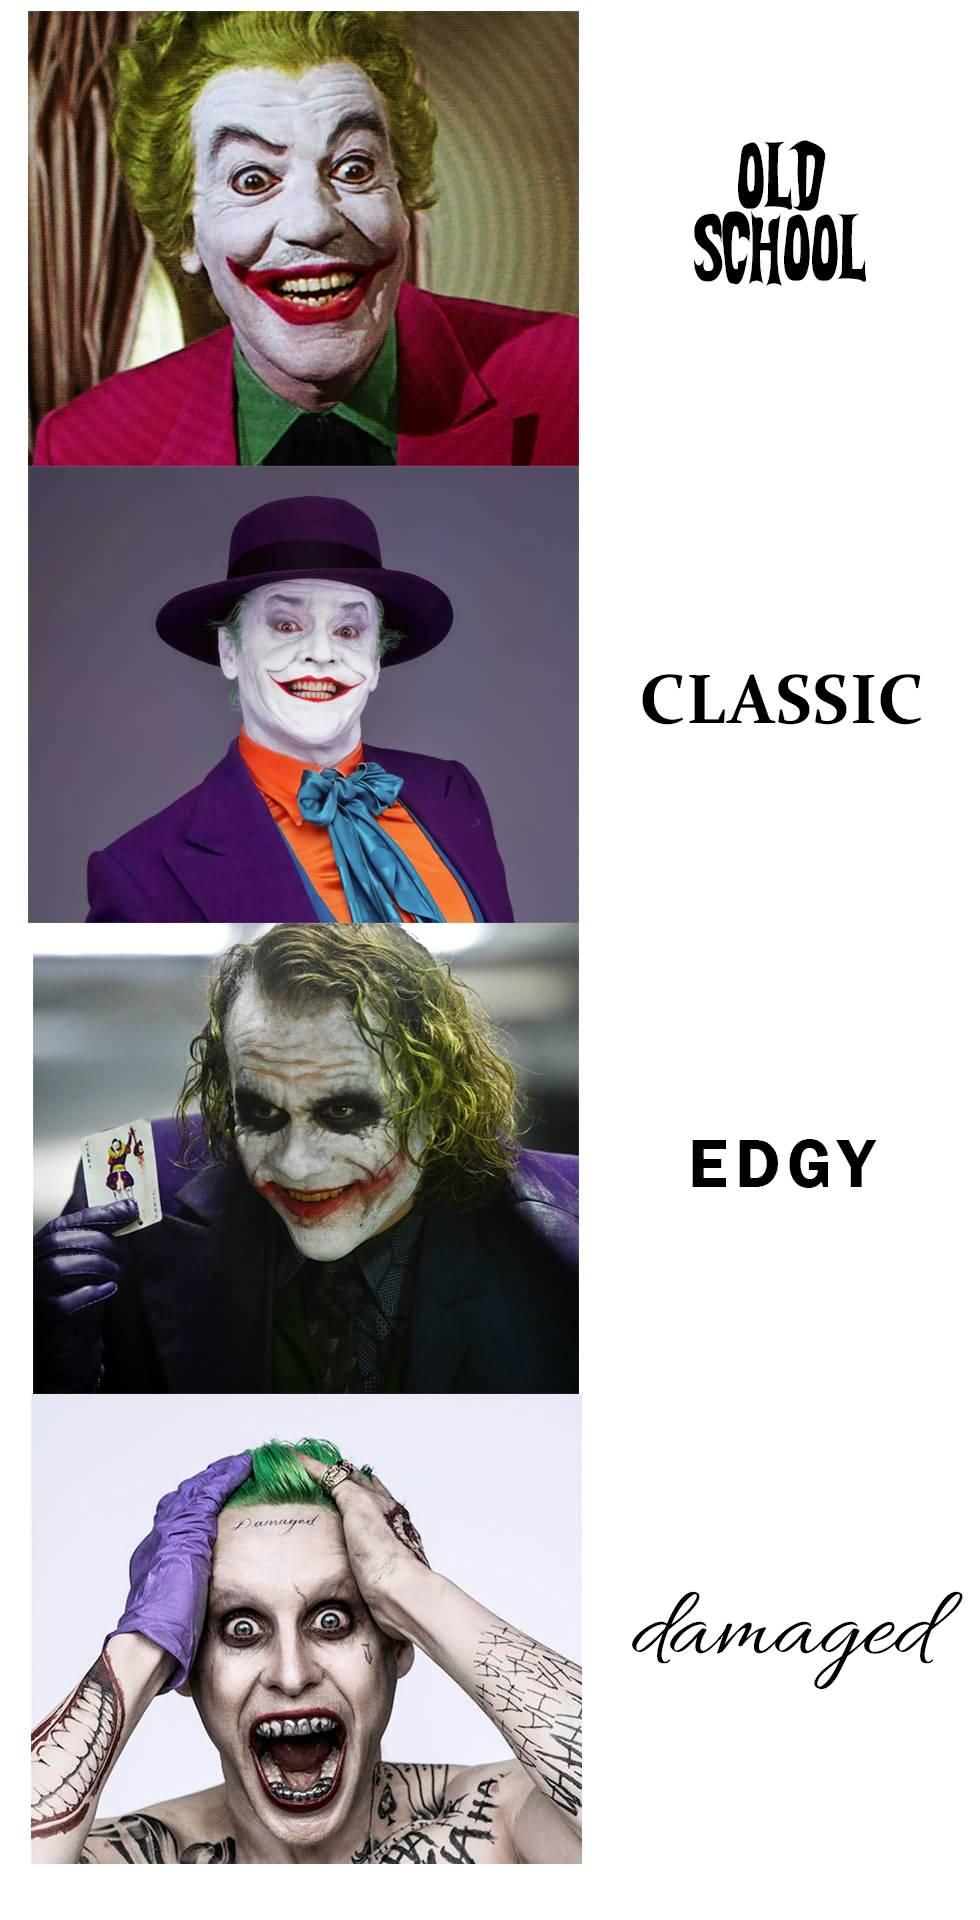 Jared Leto Joker Meme Funny Image Photo Joke 14